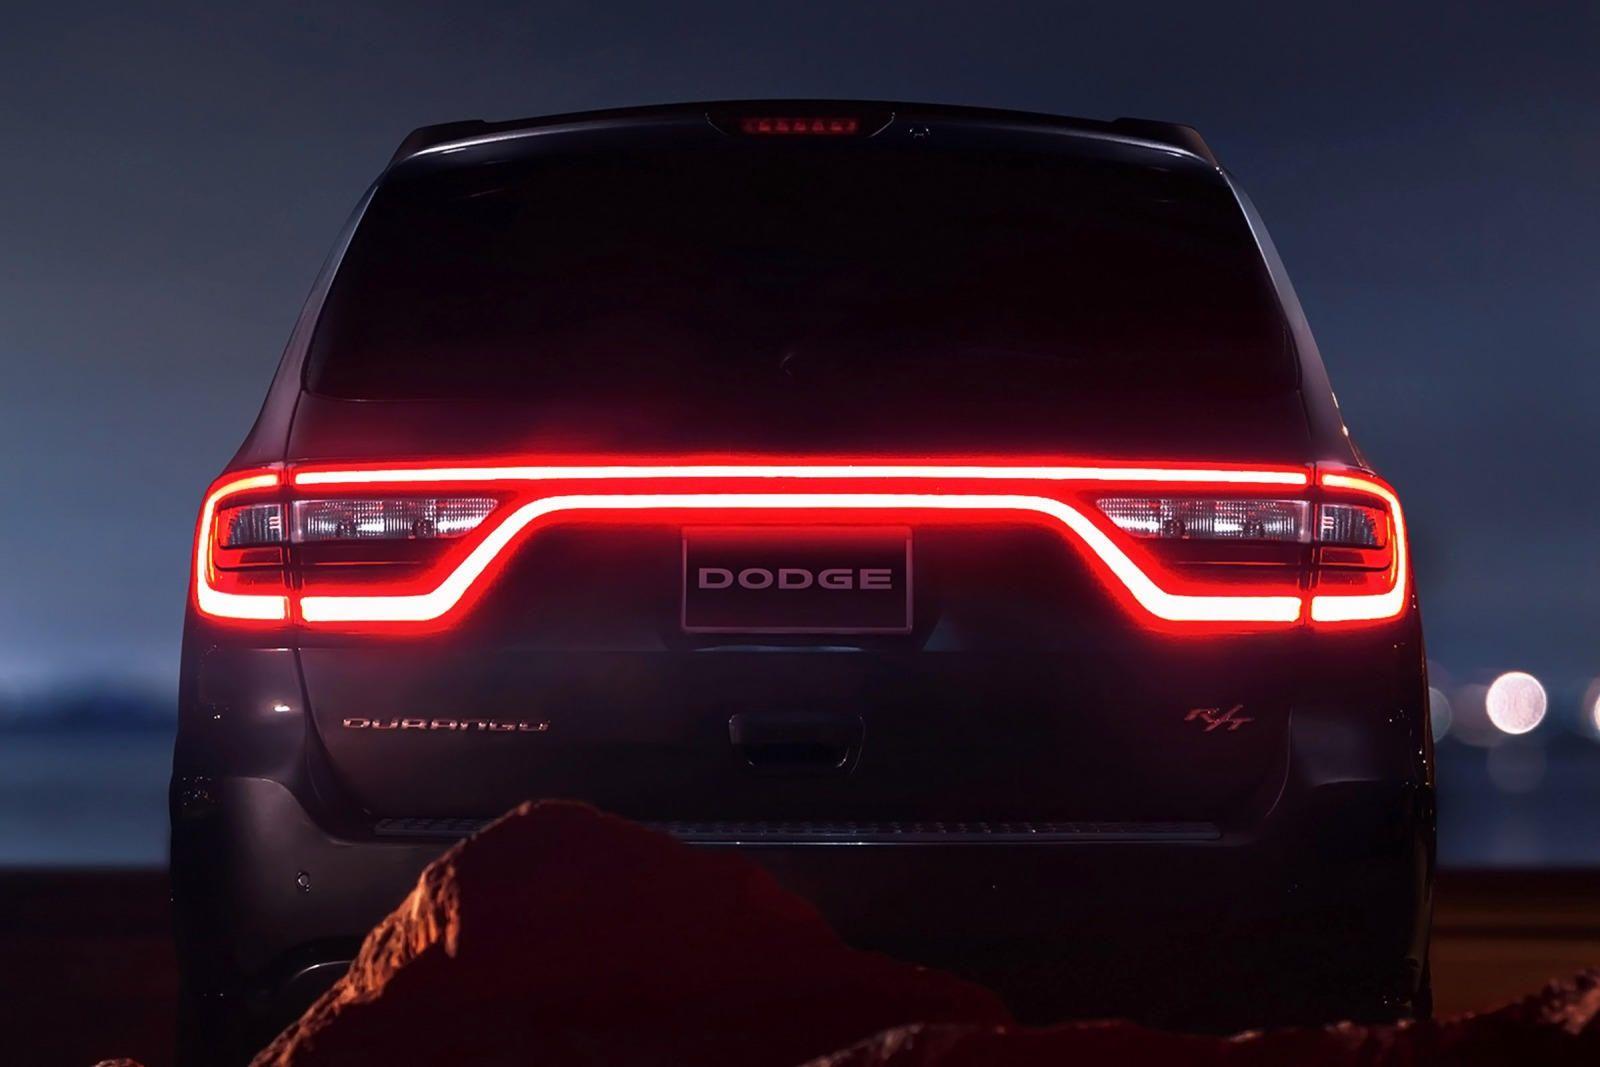 20142020 Dodge Durango R/T Rear View Photo in 2020